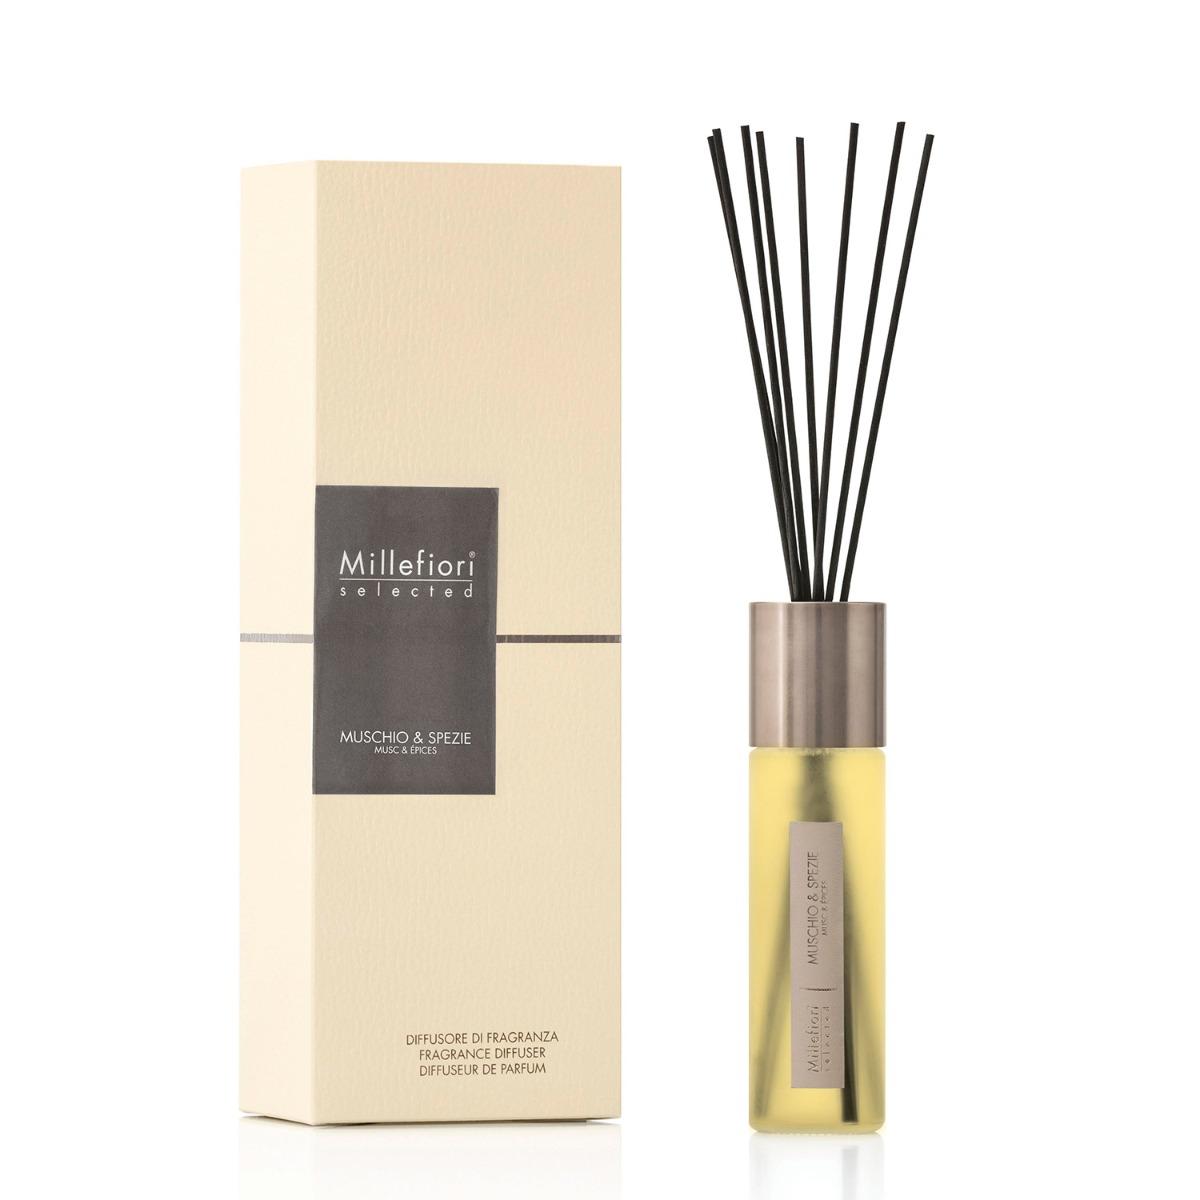 Millefiori Selected Muschio Spezie 100ml Fragrance Diffuser Campus Gifts